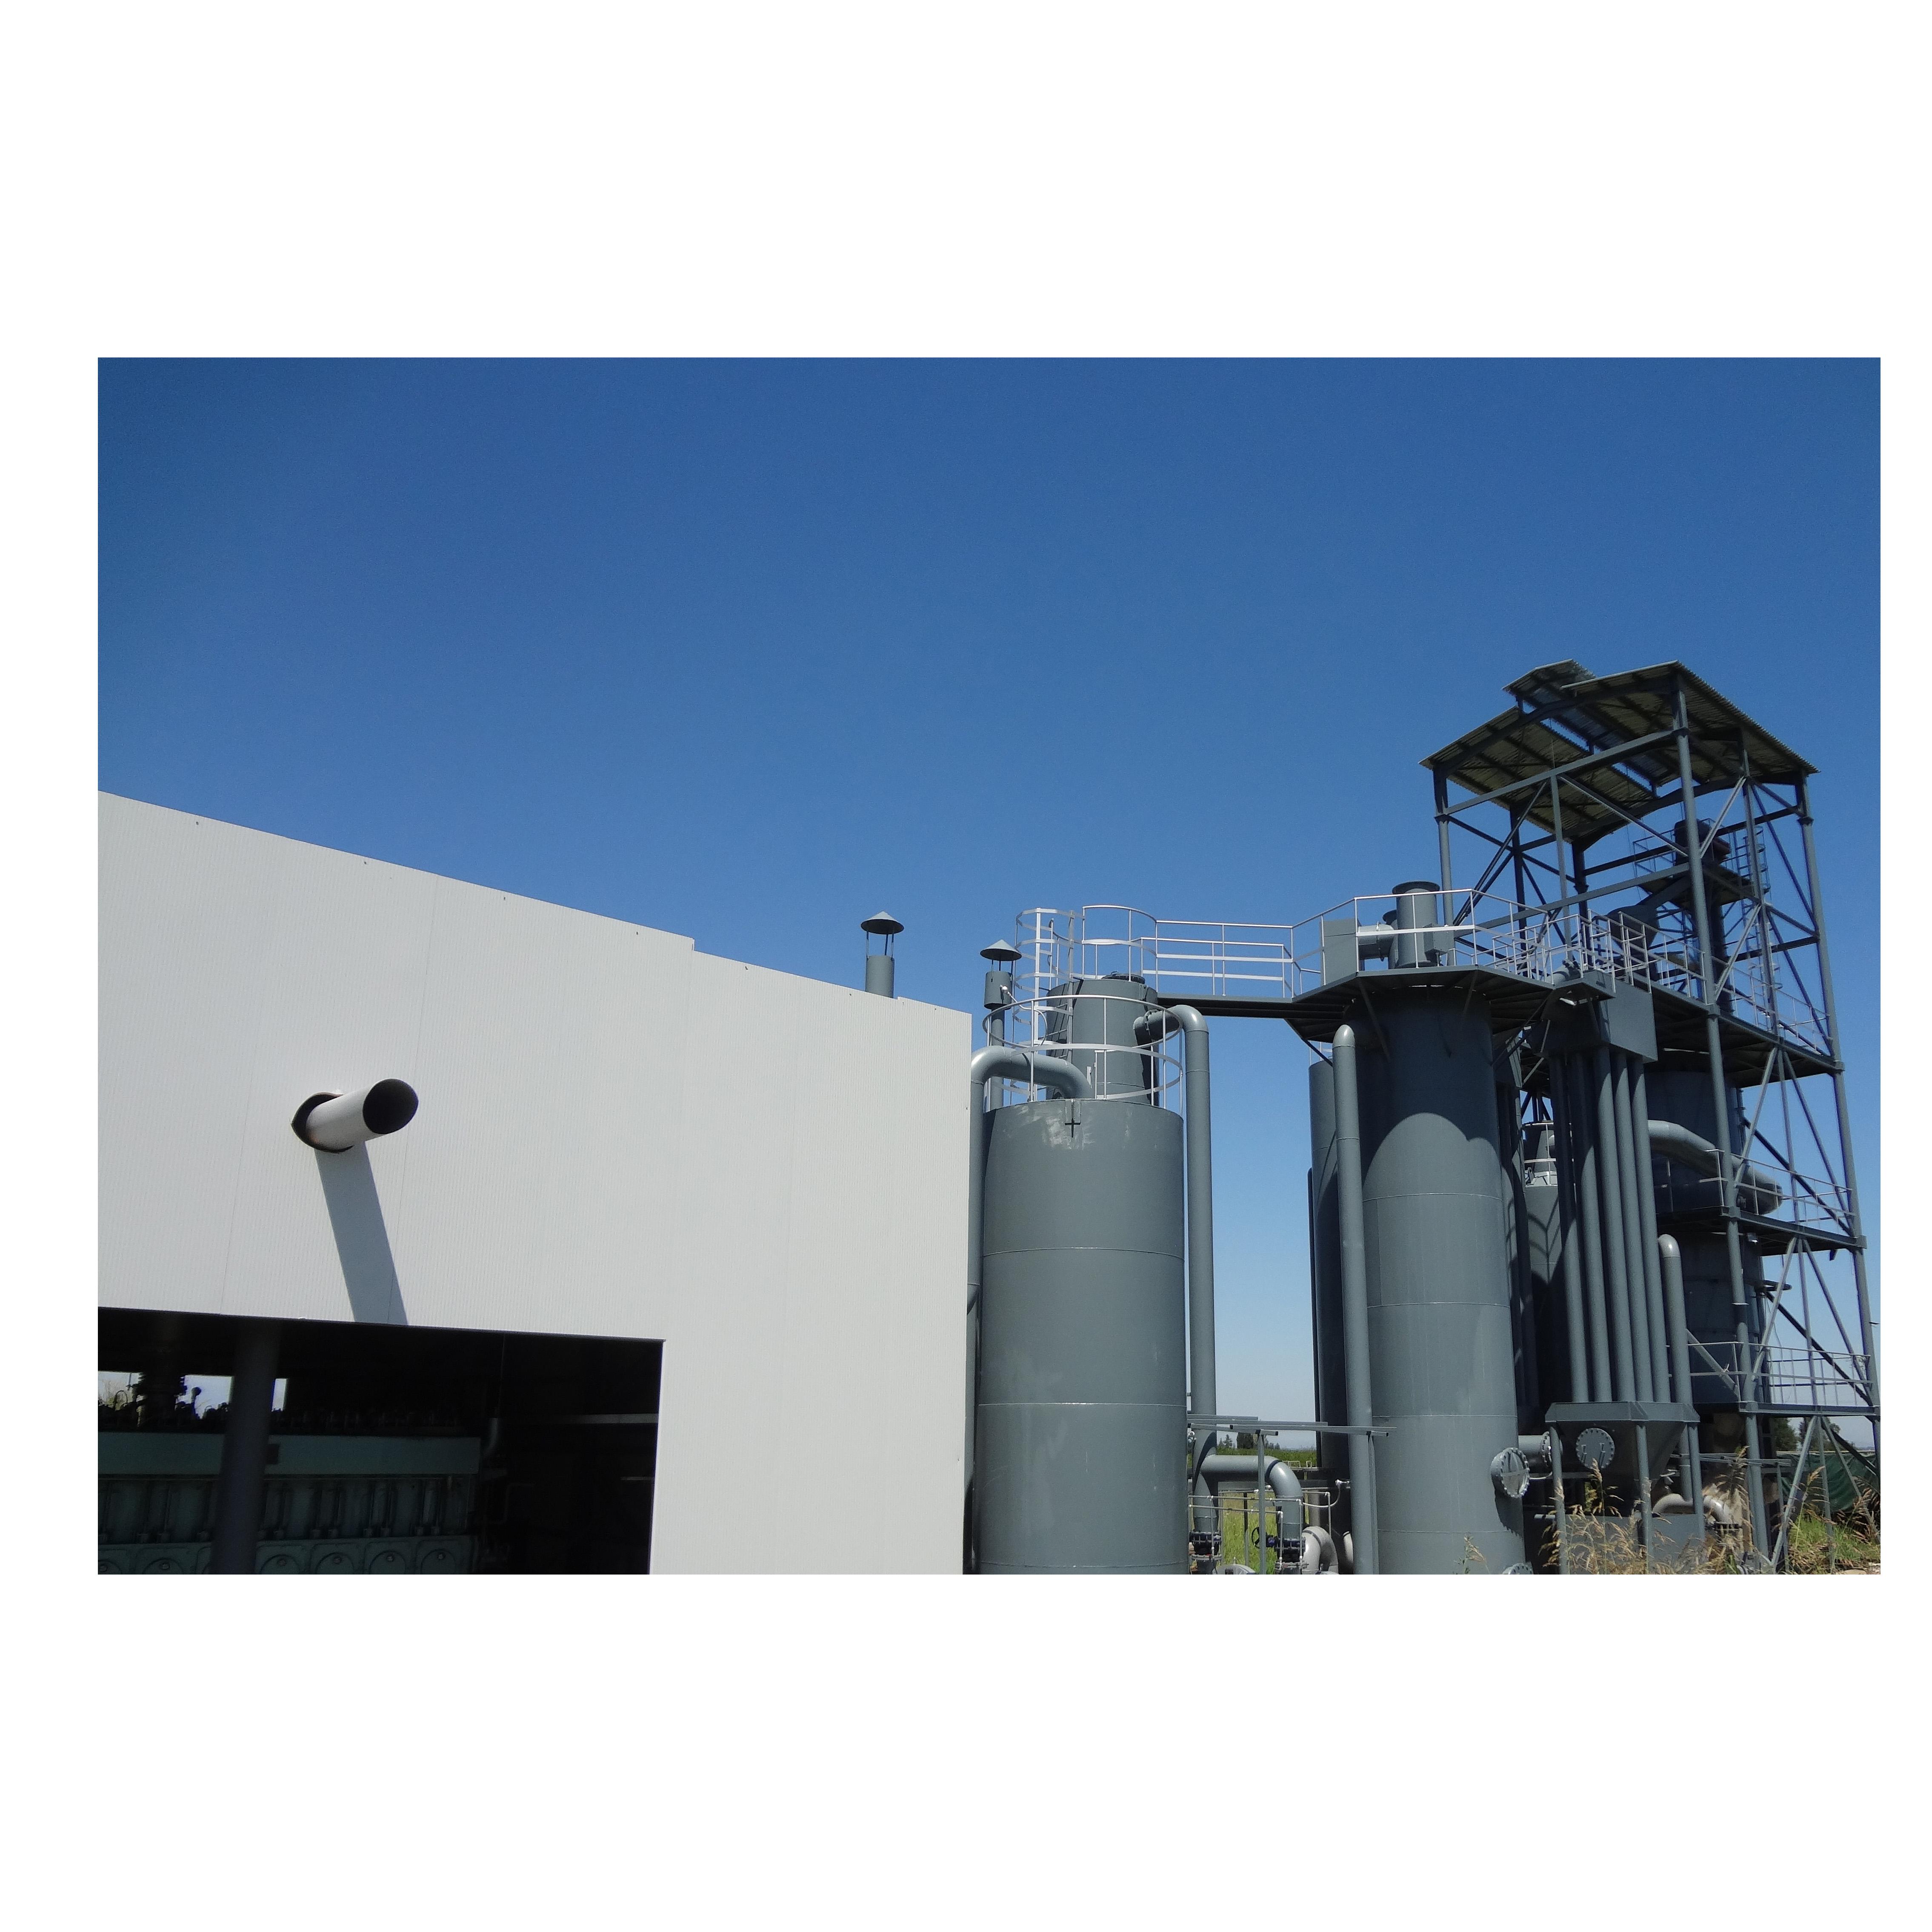 Urban Soild Waste to Energy Power Generation Equipment for Sale